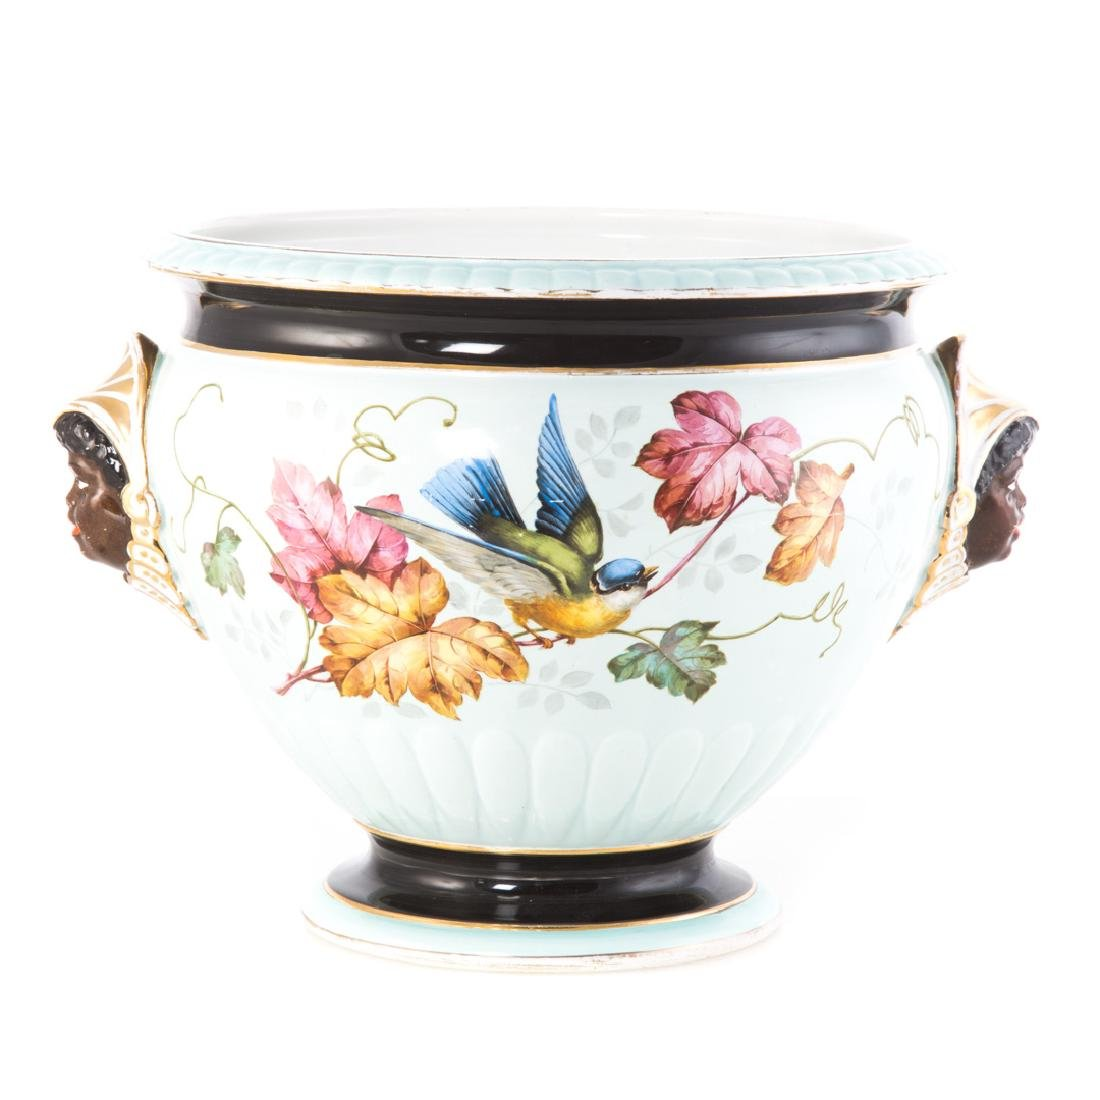 Rorstrand ceramic jardiniere